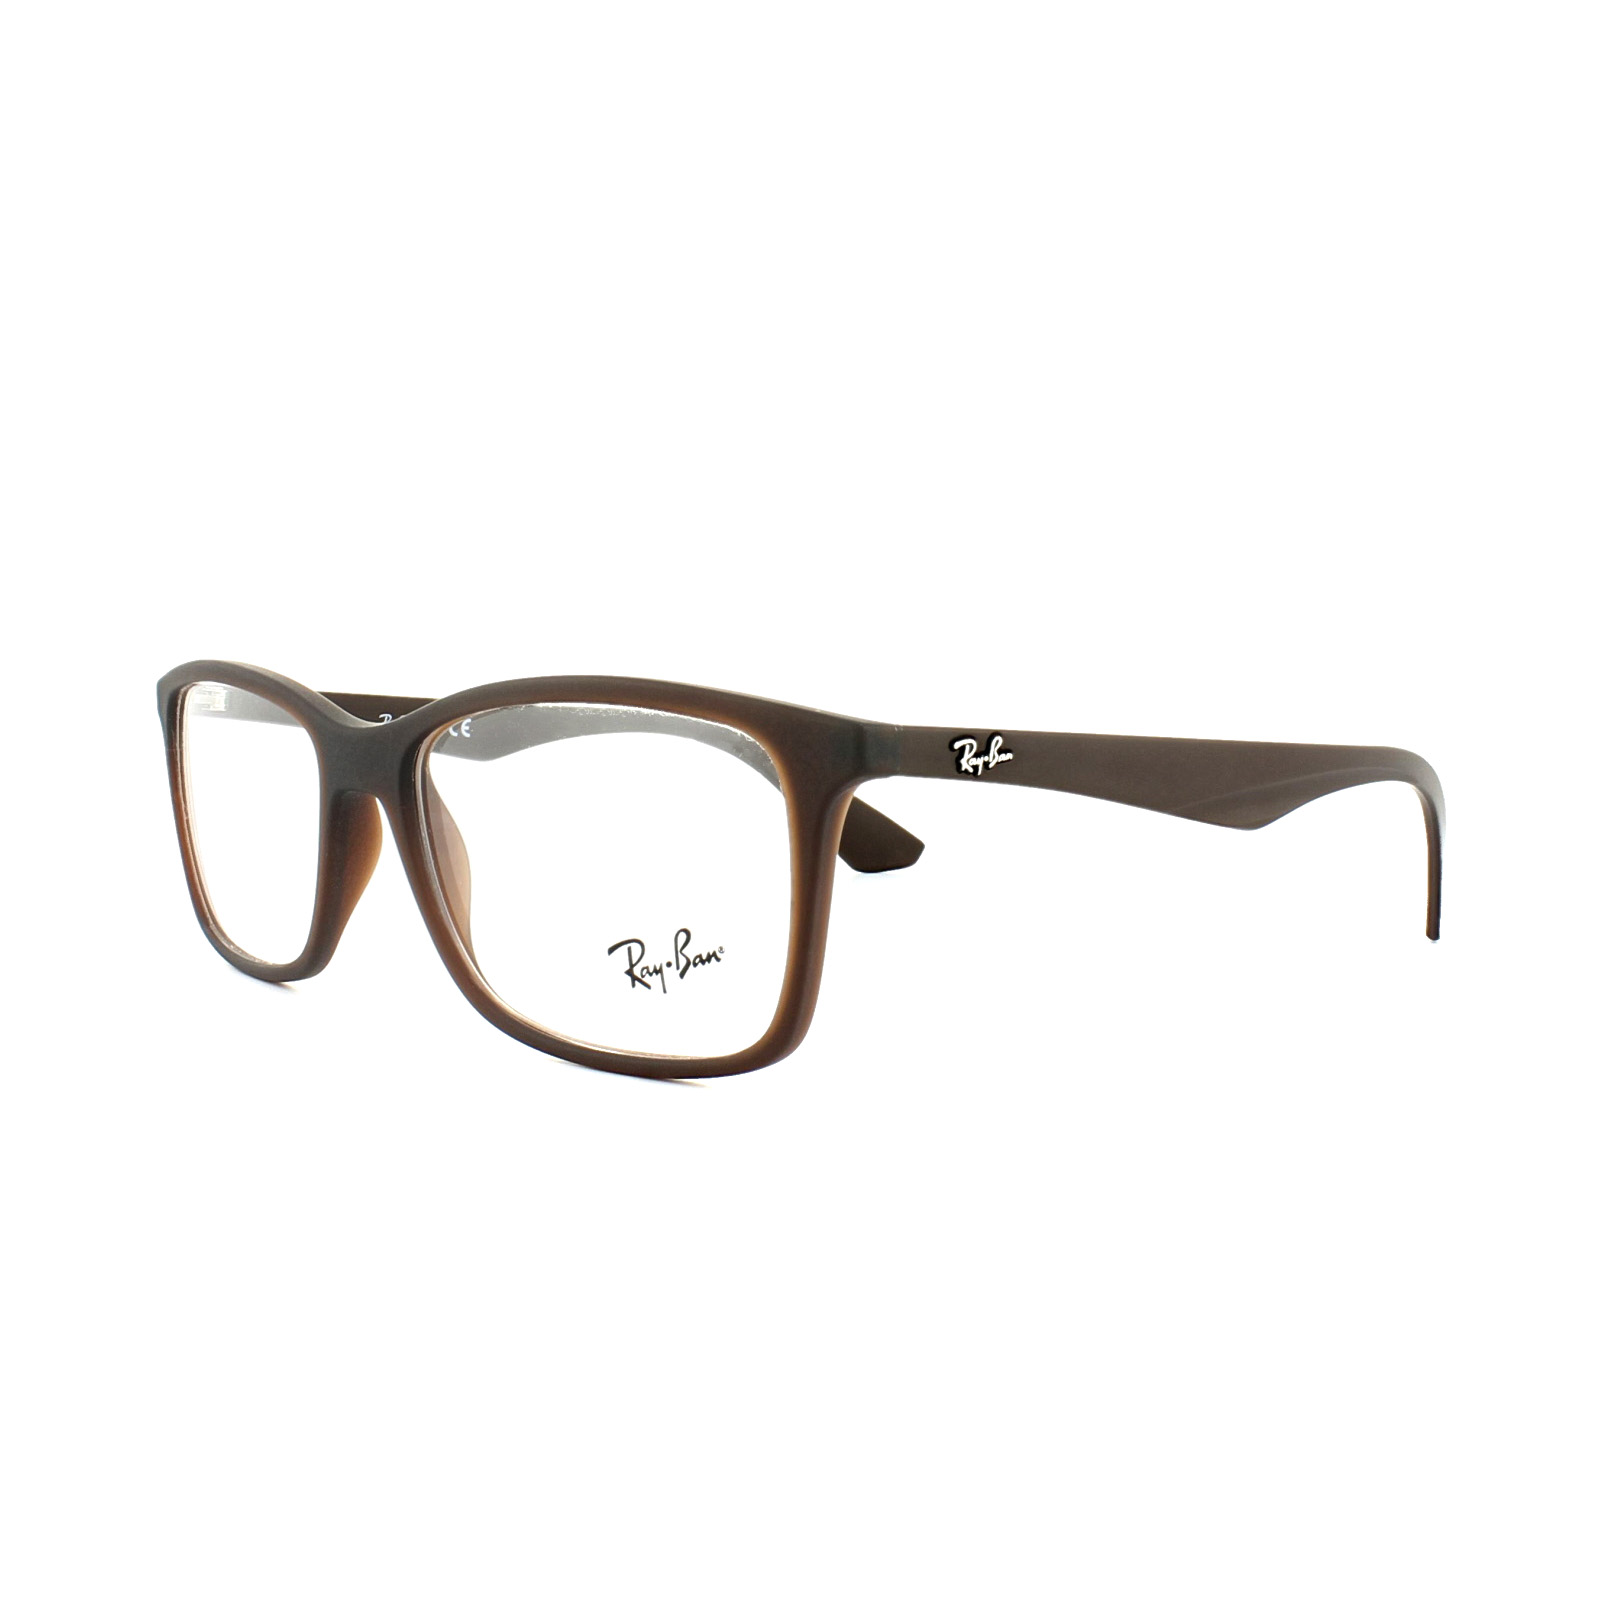 Ray-Ban Glasses Frames 7047 5451 Matt Transparent Brown Mens 56mm   eBay